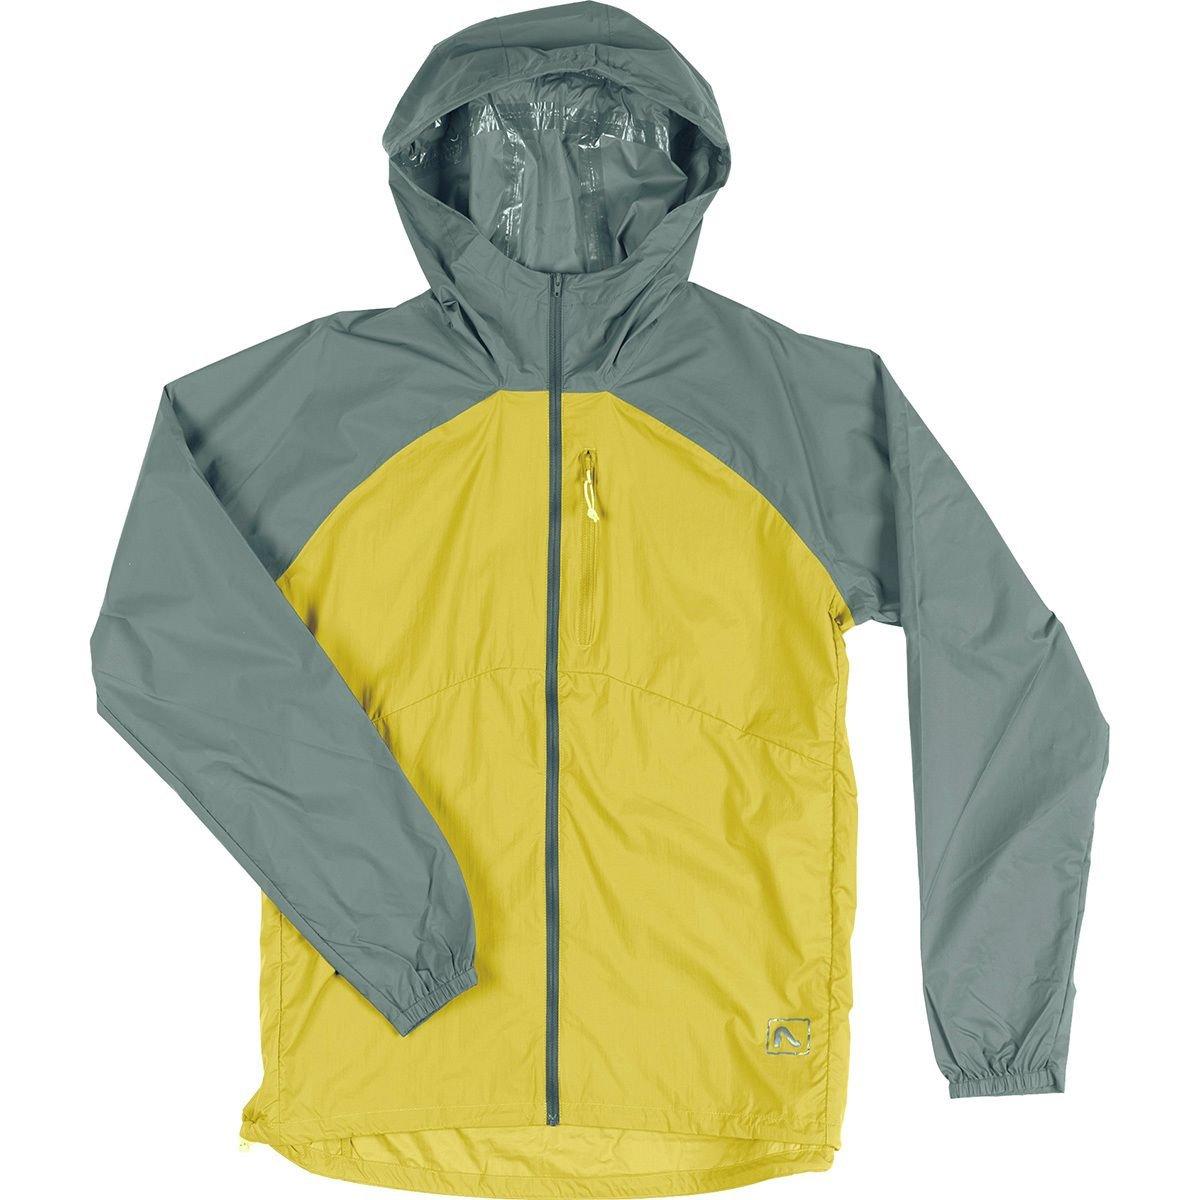 Flylow Rainbreaker Jacket – Men 's B07BWW1JQN M Herb/Squash Herb/Squash M